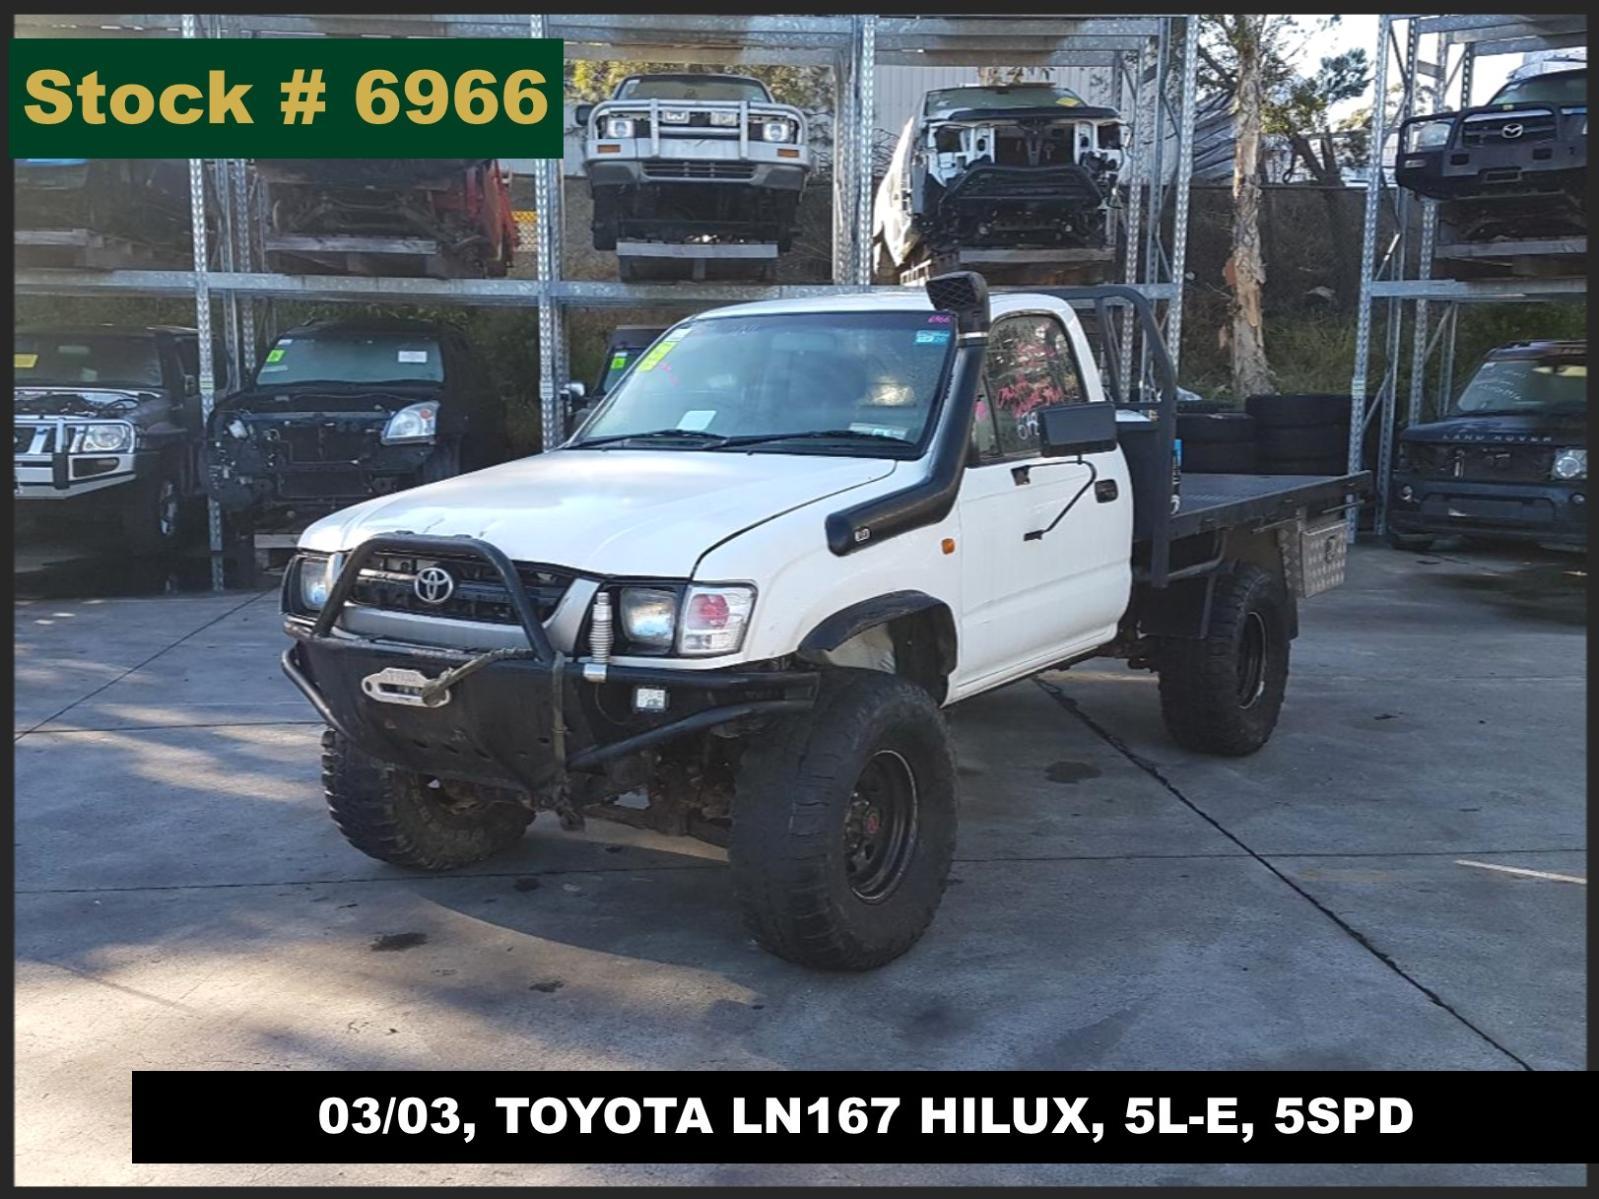 Kelebihan Toyota Hilux 2003 Murah Berkualitas